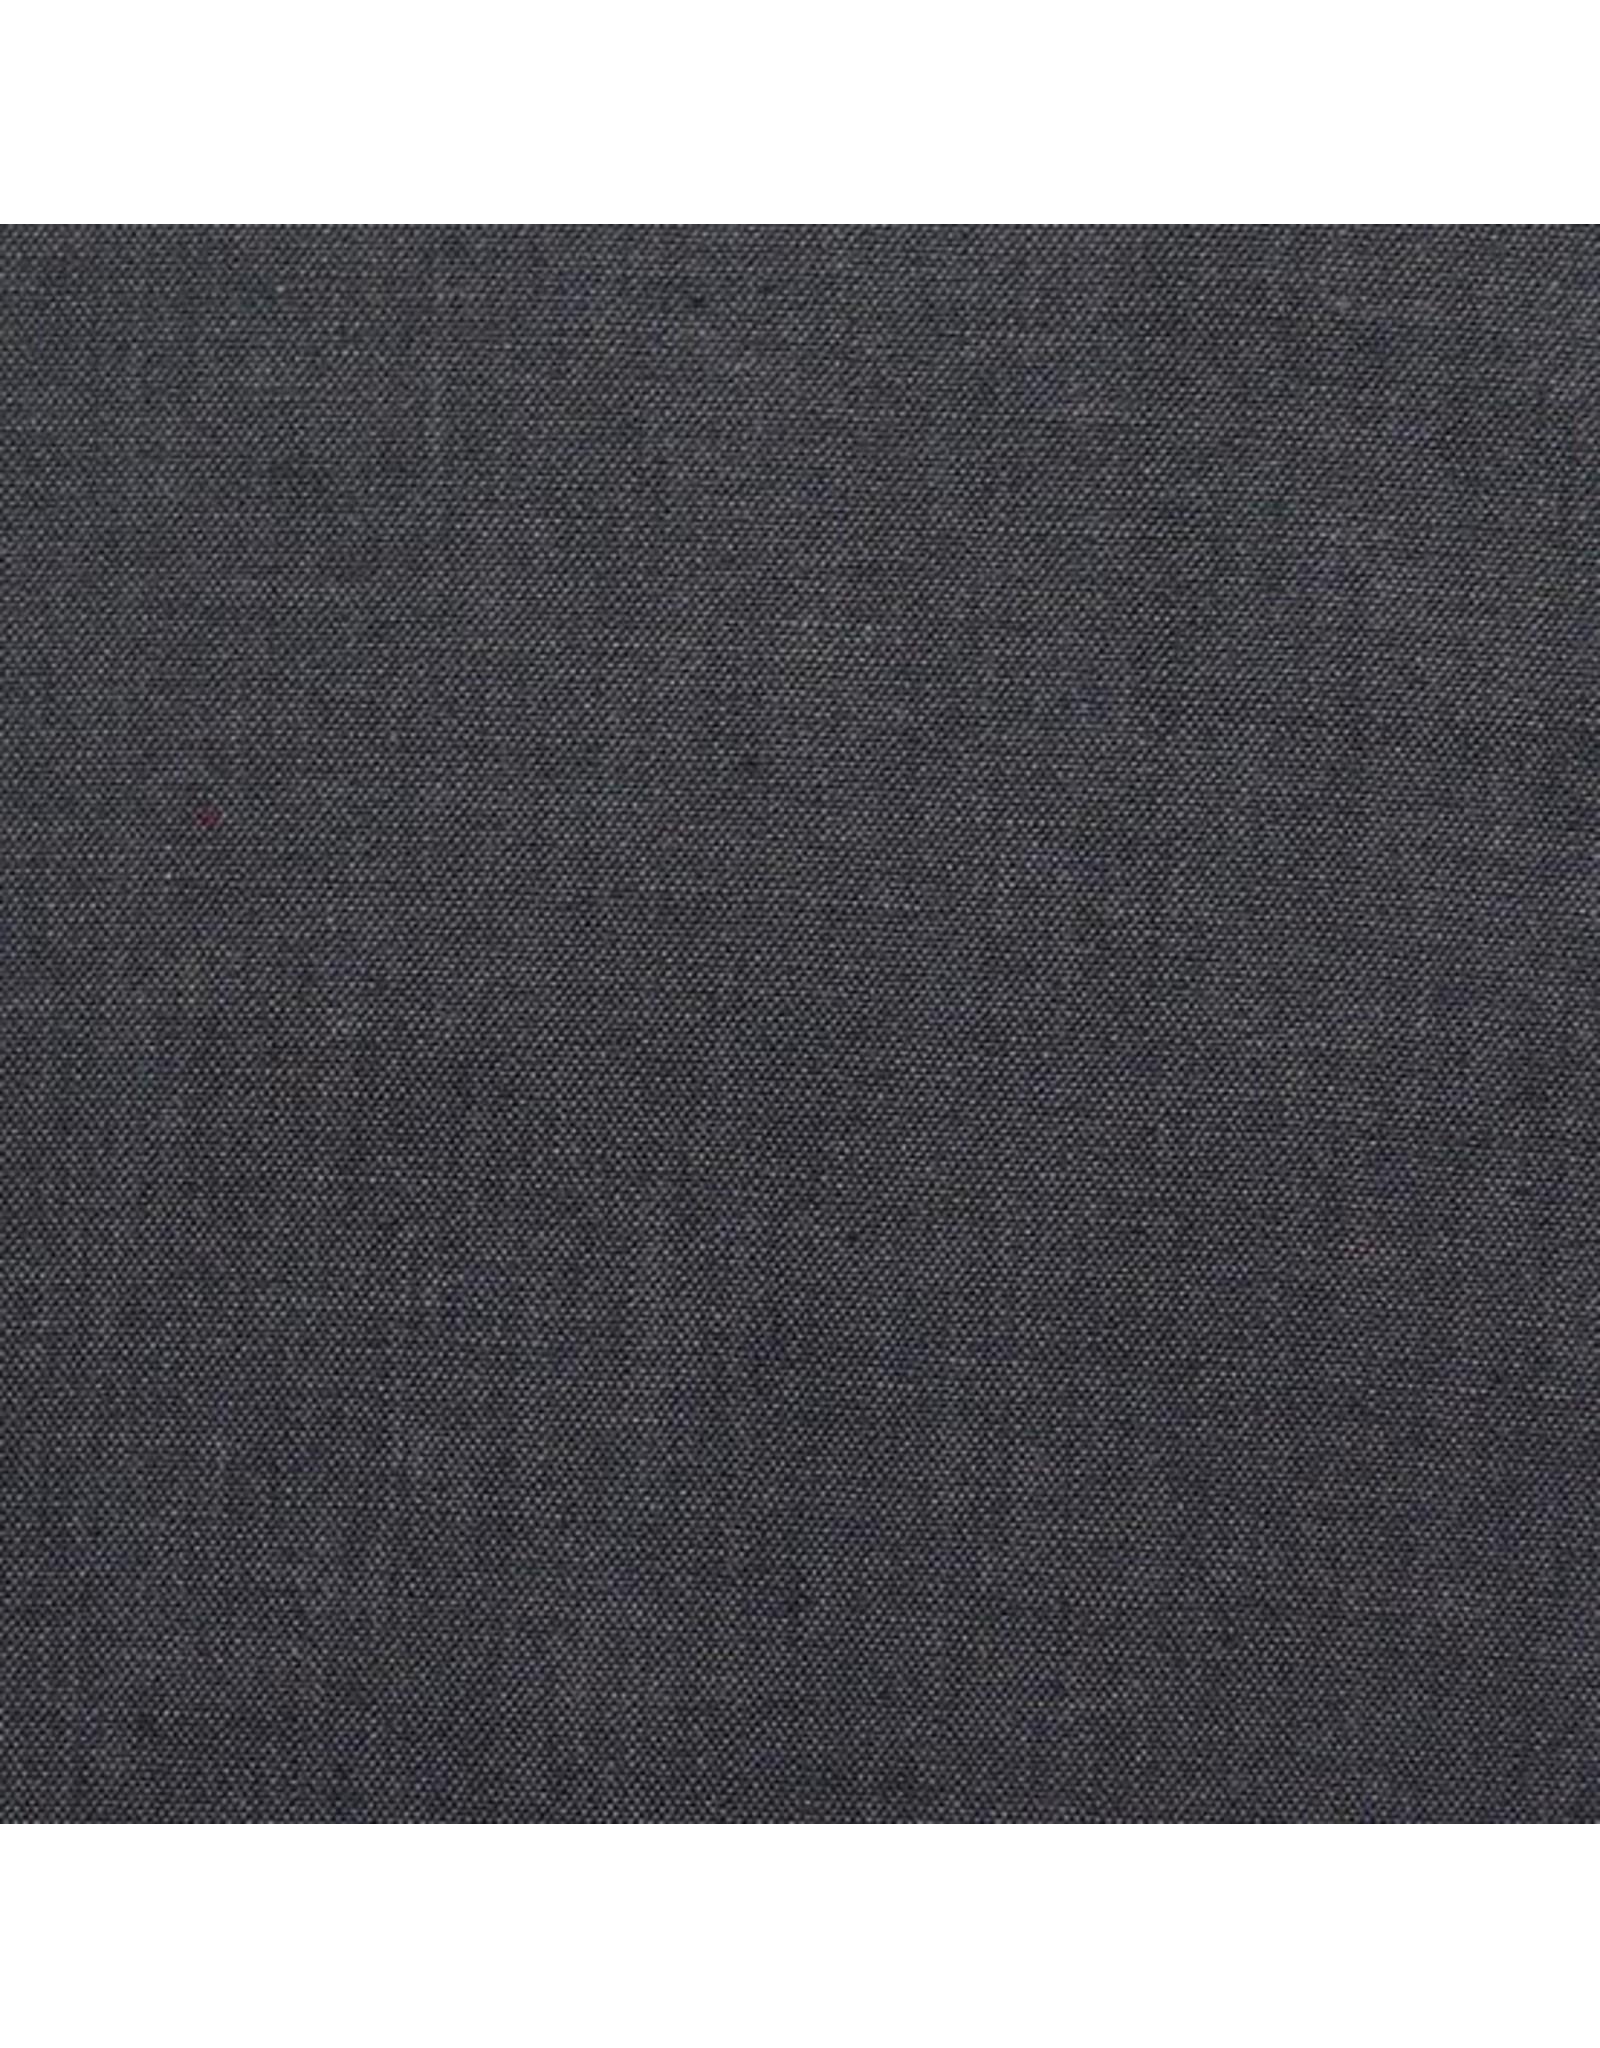 Alison Glass Kaleidoscope in Raven, Fabric Half-Yards